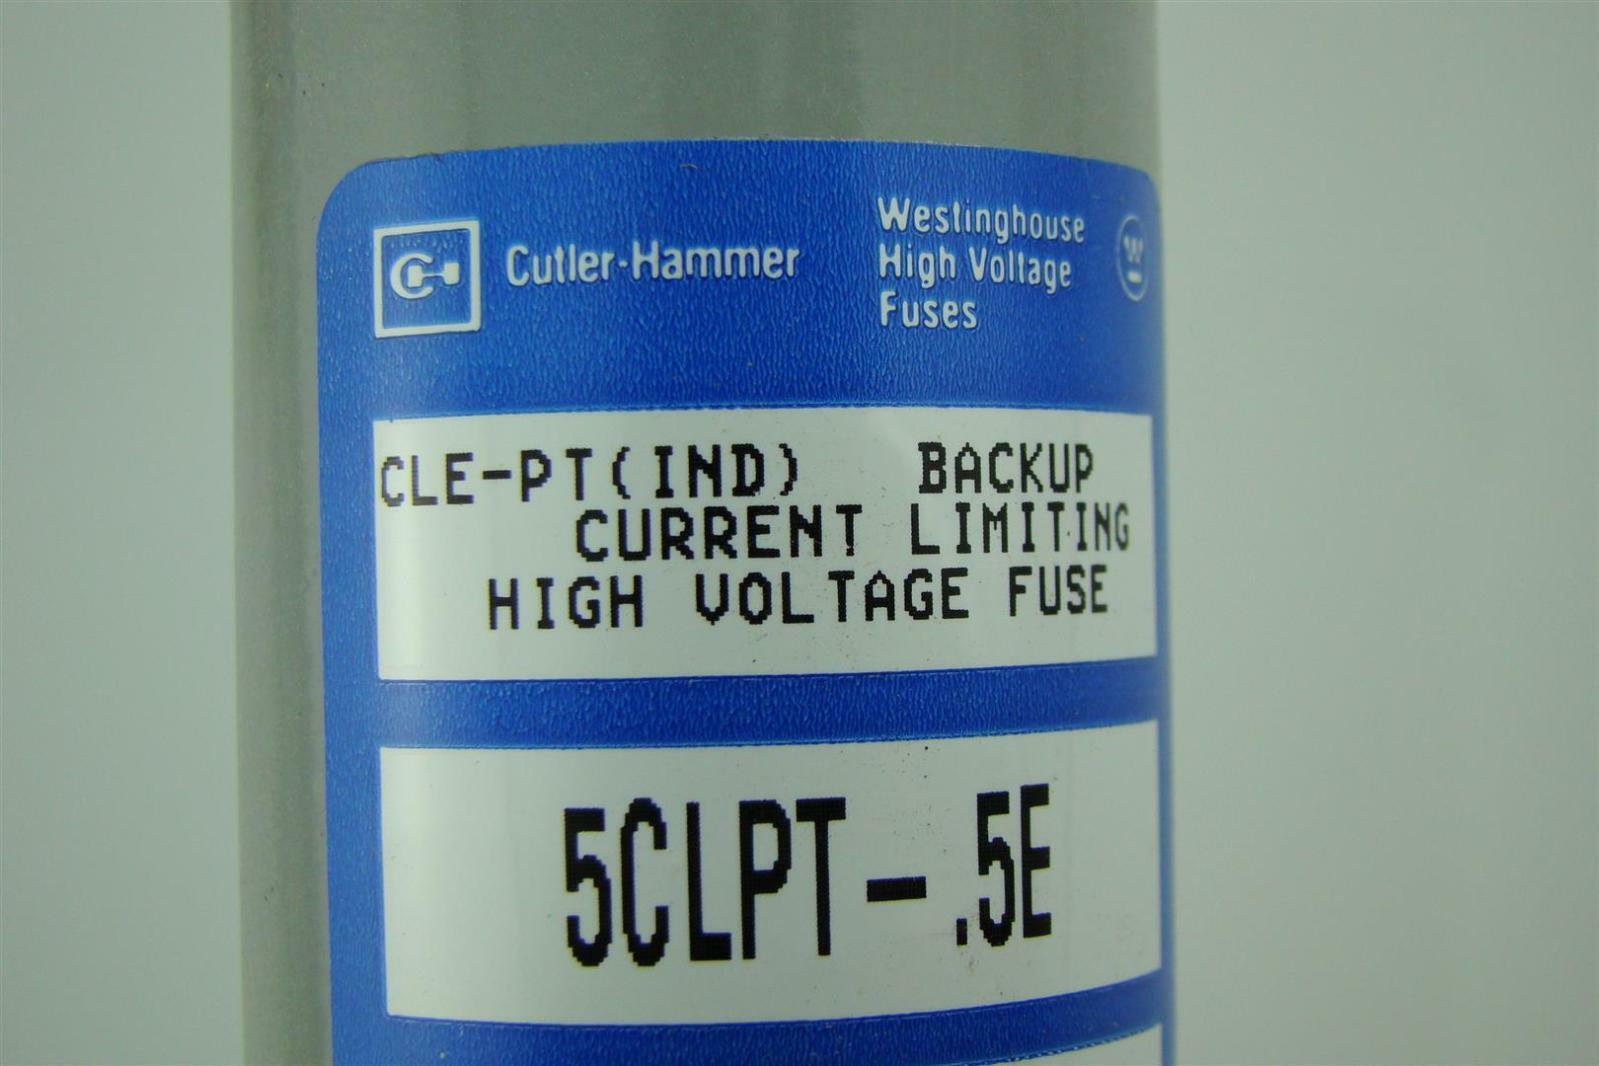 Westinghouse Cutler Hammer High Voltage Fuses 55kv 5clpt 5e Ebay Fuse Box